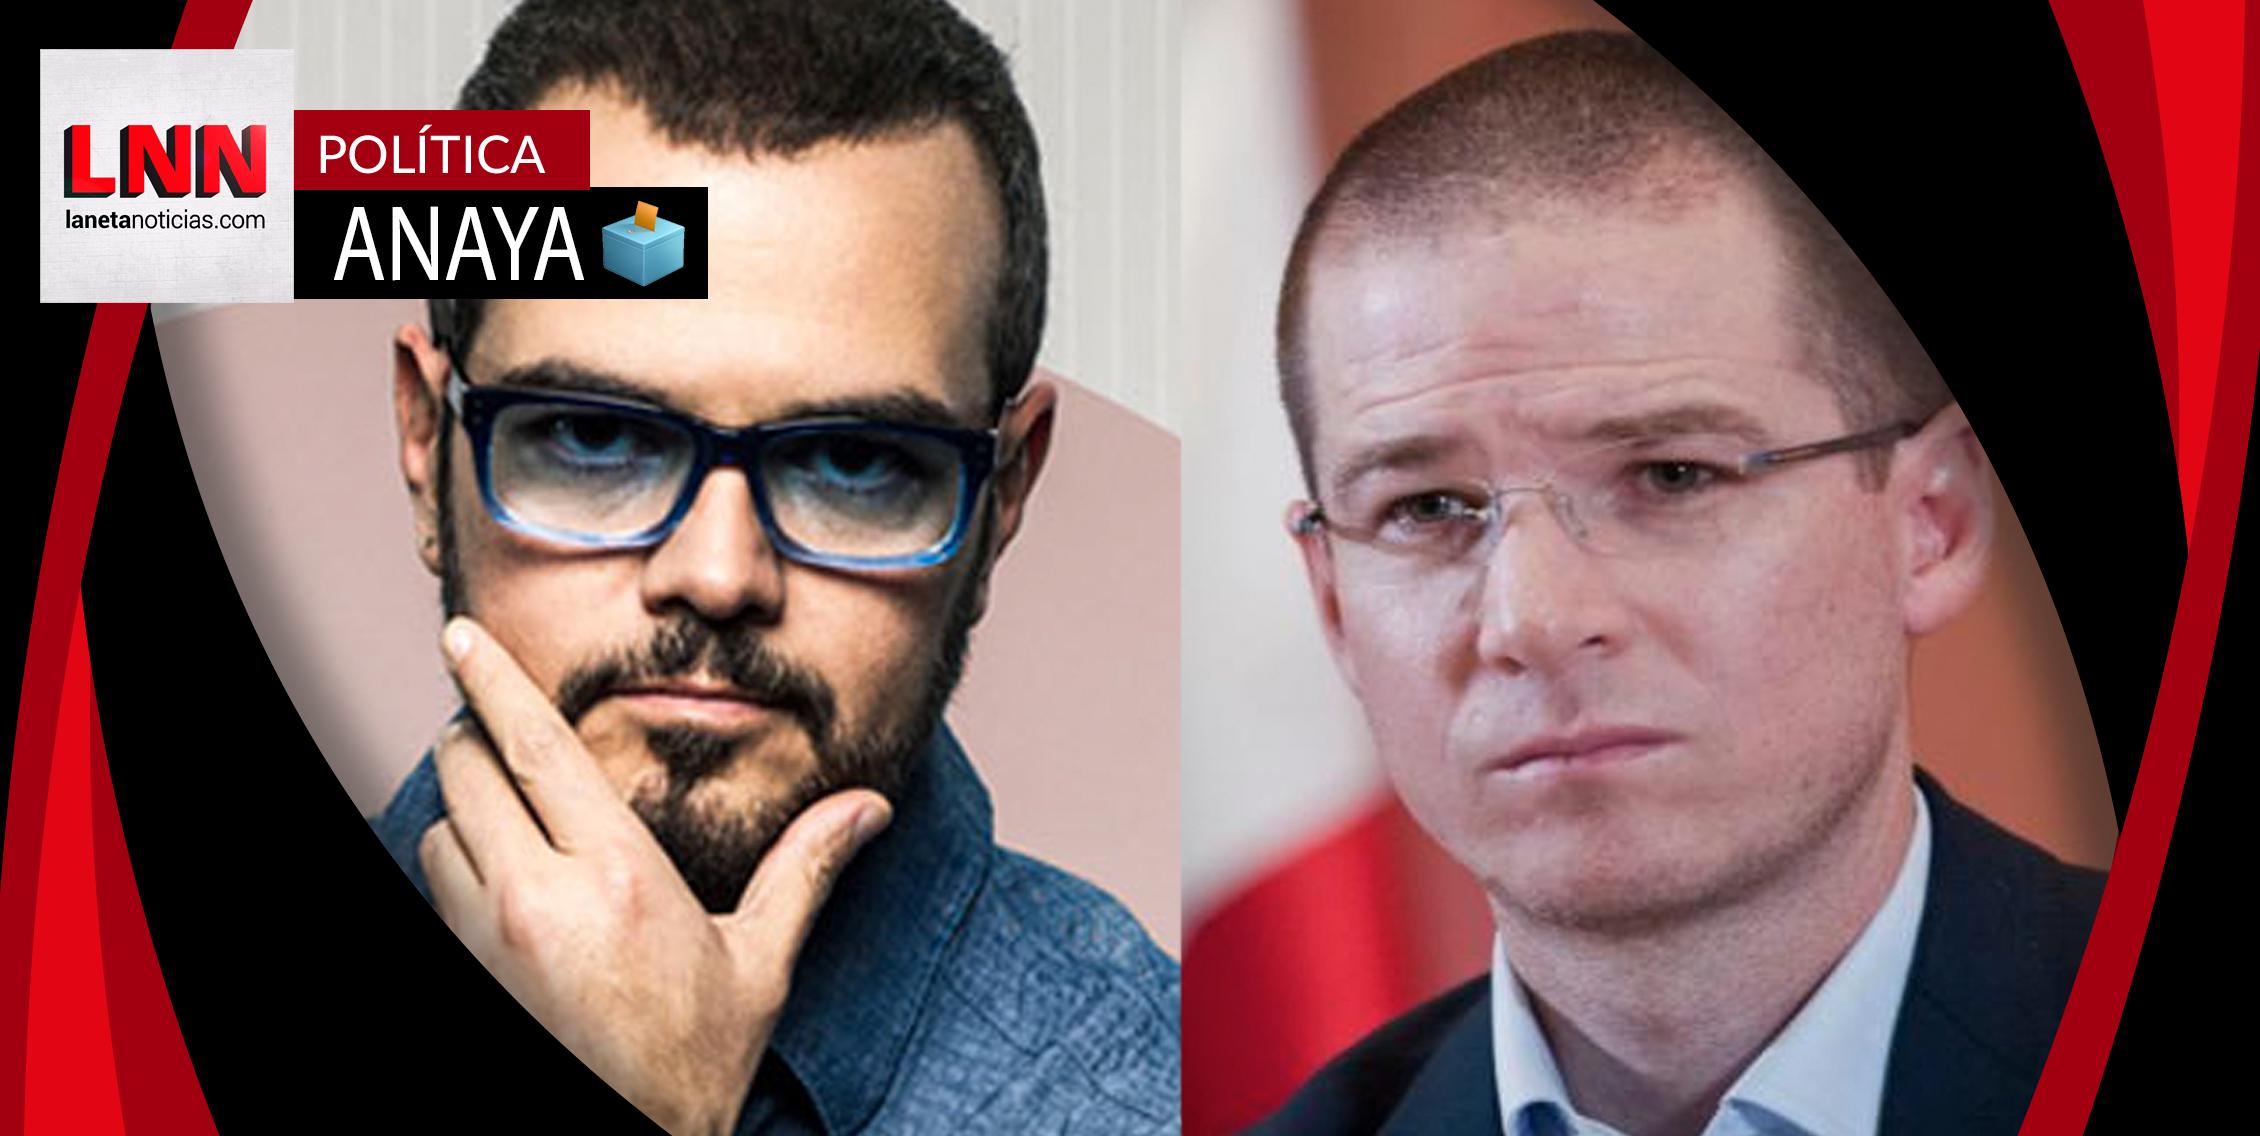 Aleks Syntek explota contra Ricardo Anaya por usar su canción sin permiso